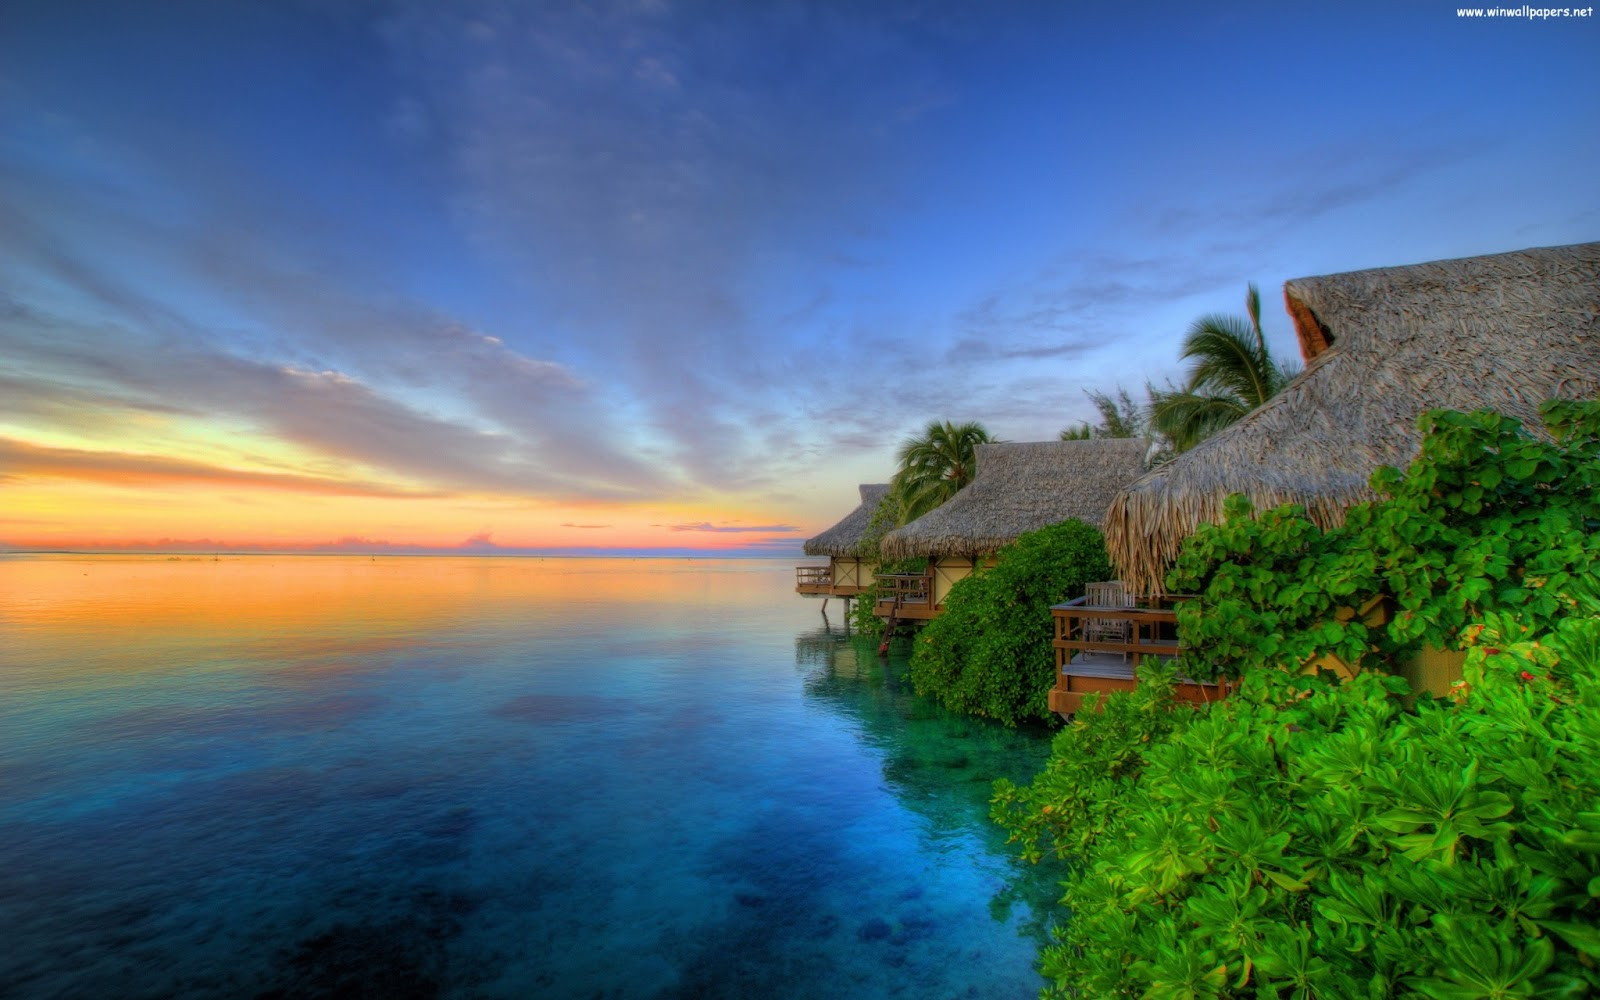 Tahiti - French Polynesia picture